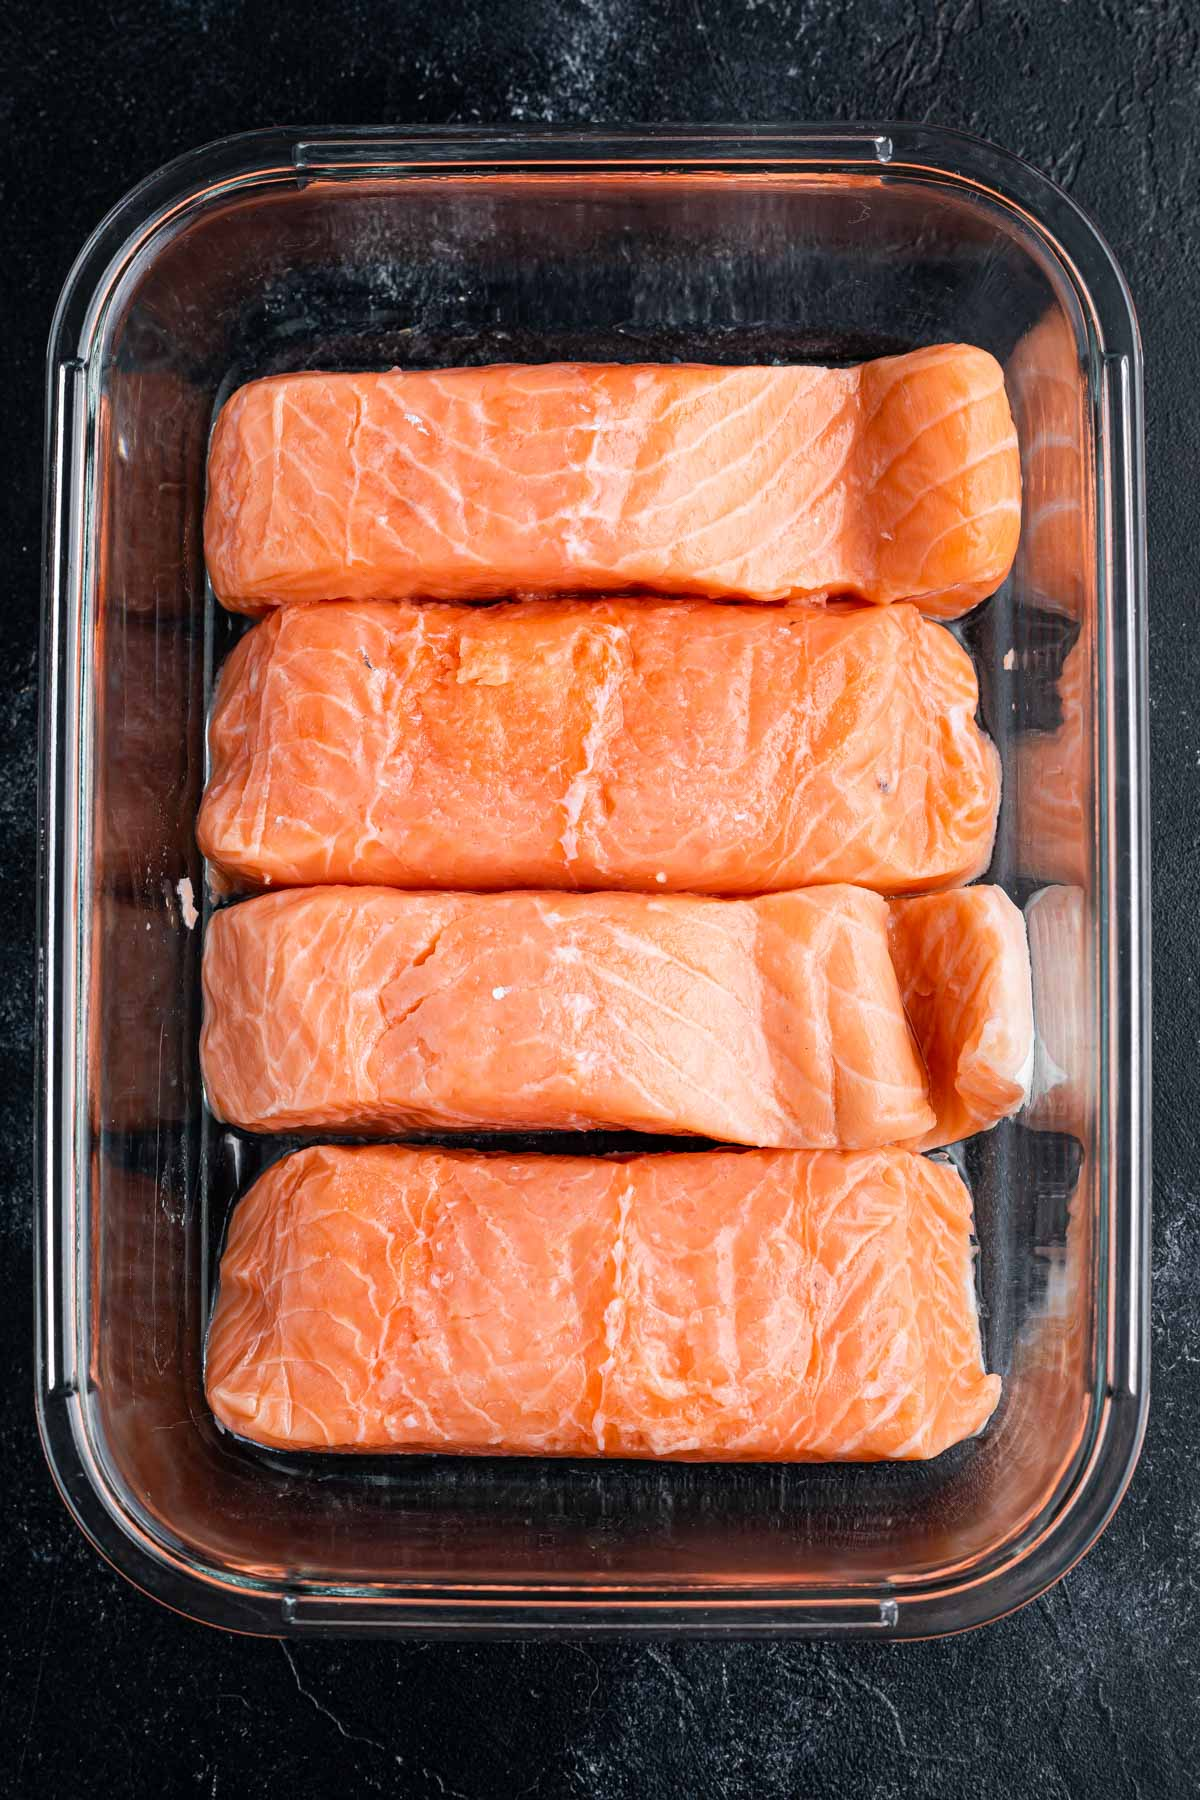 salmon filets in glass dish